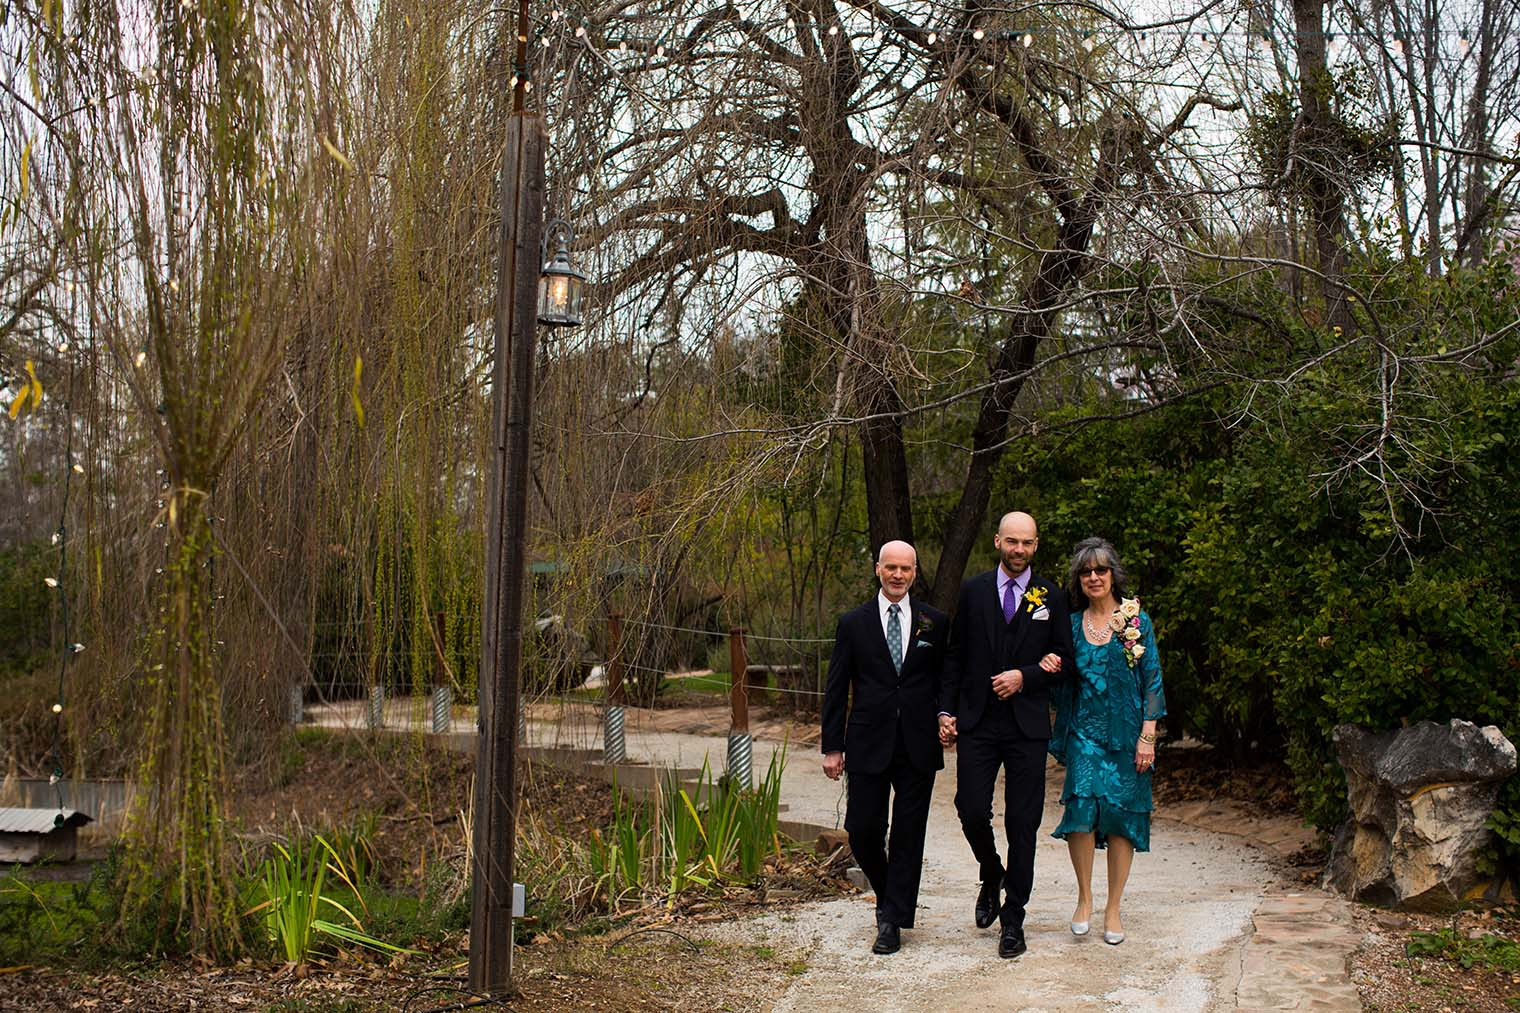 Union Hill Inn Wedding Ceremony in Sonora CA